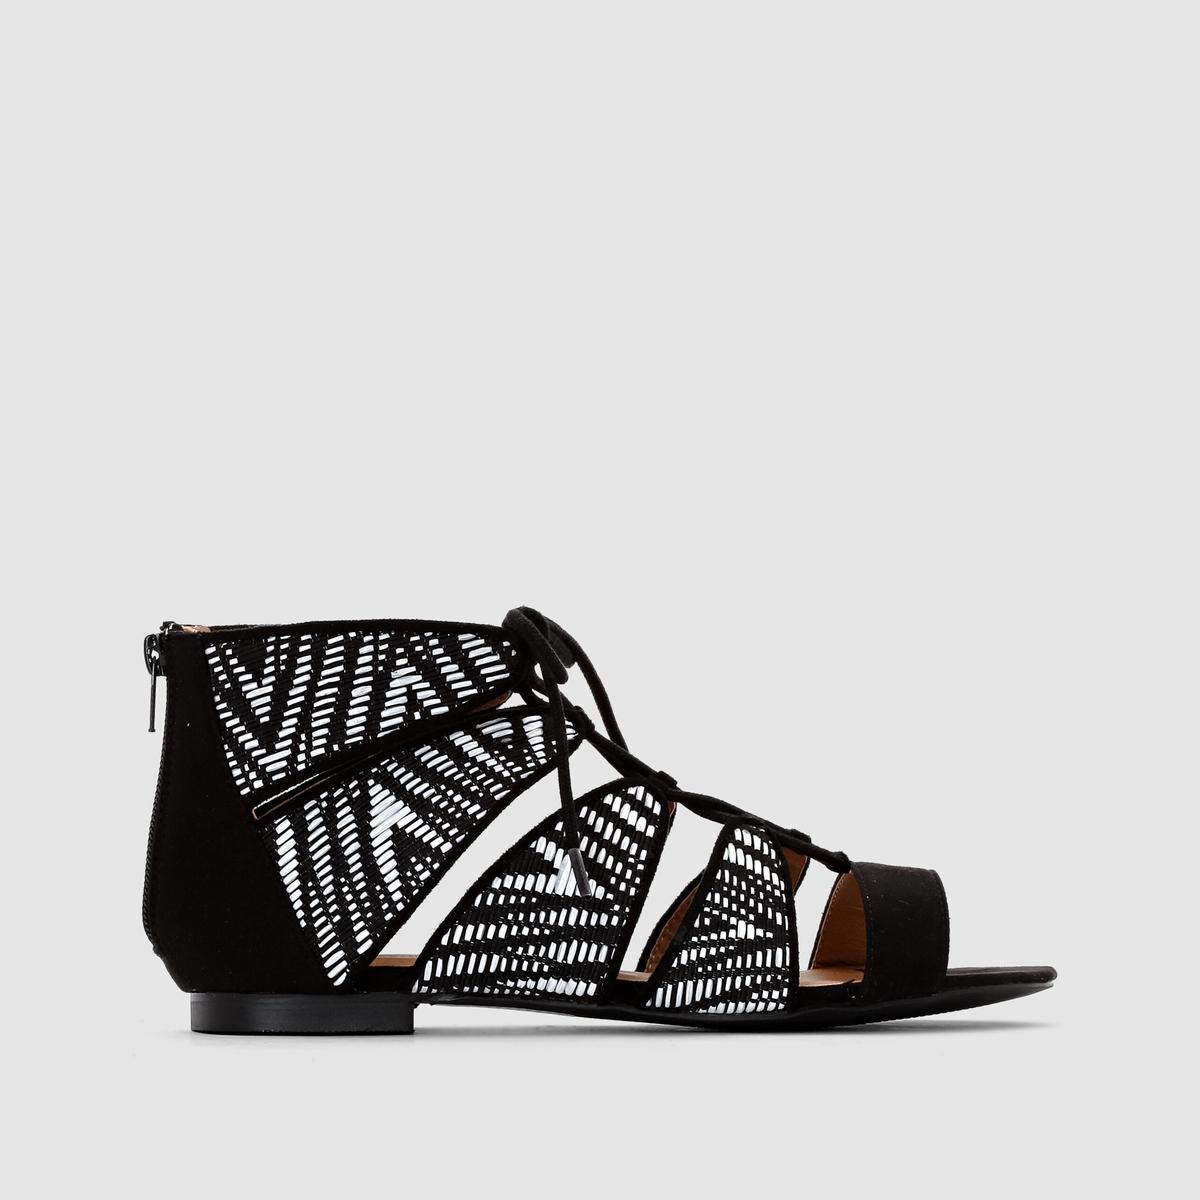 Босоножки босоножки кожаные на плоском каблуке la conquise